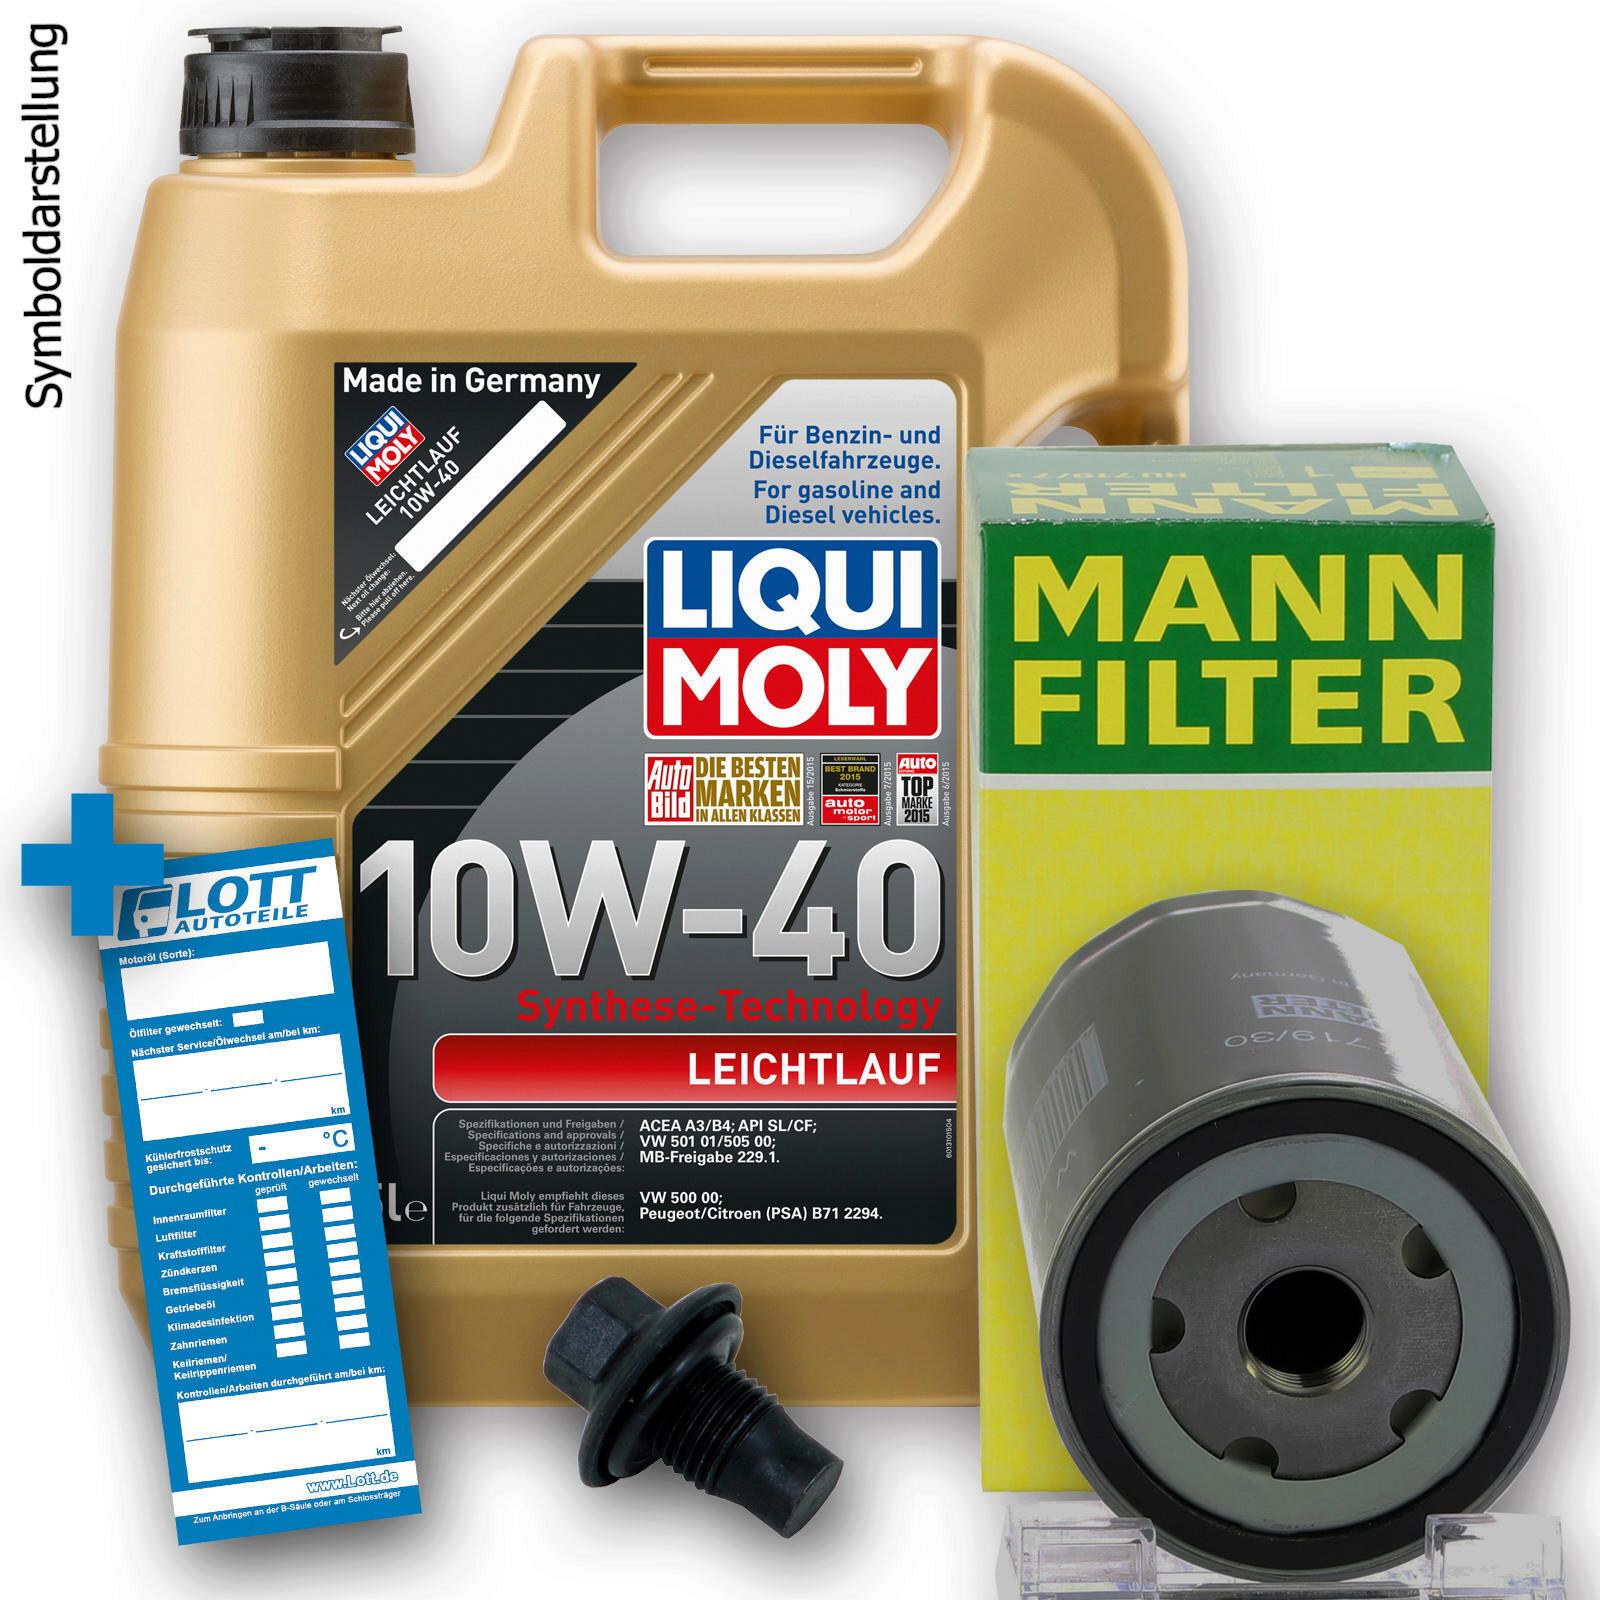 Ölwechsel Set 5L 10W40 Öl Motoröl LIQUI MOLY + MANN Ölfilter